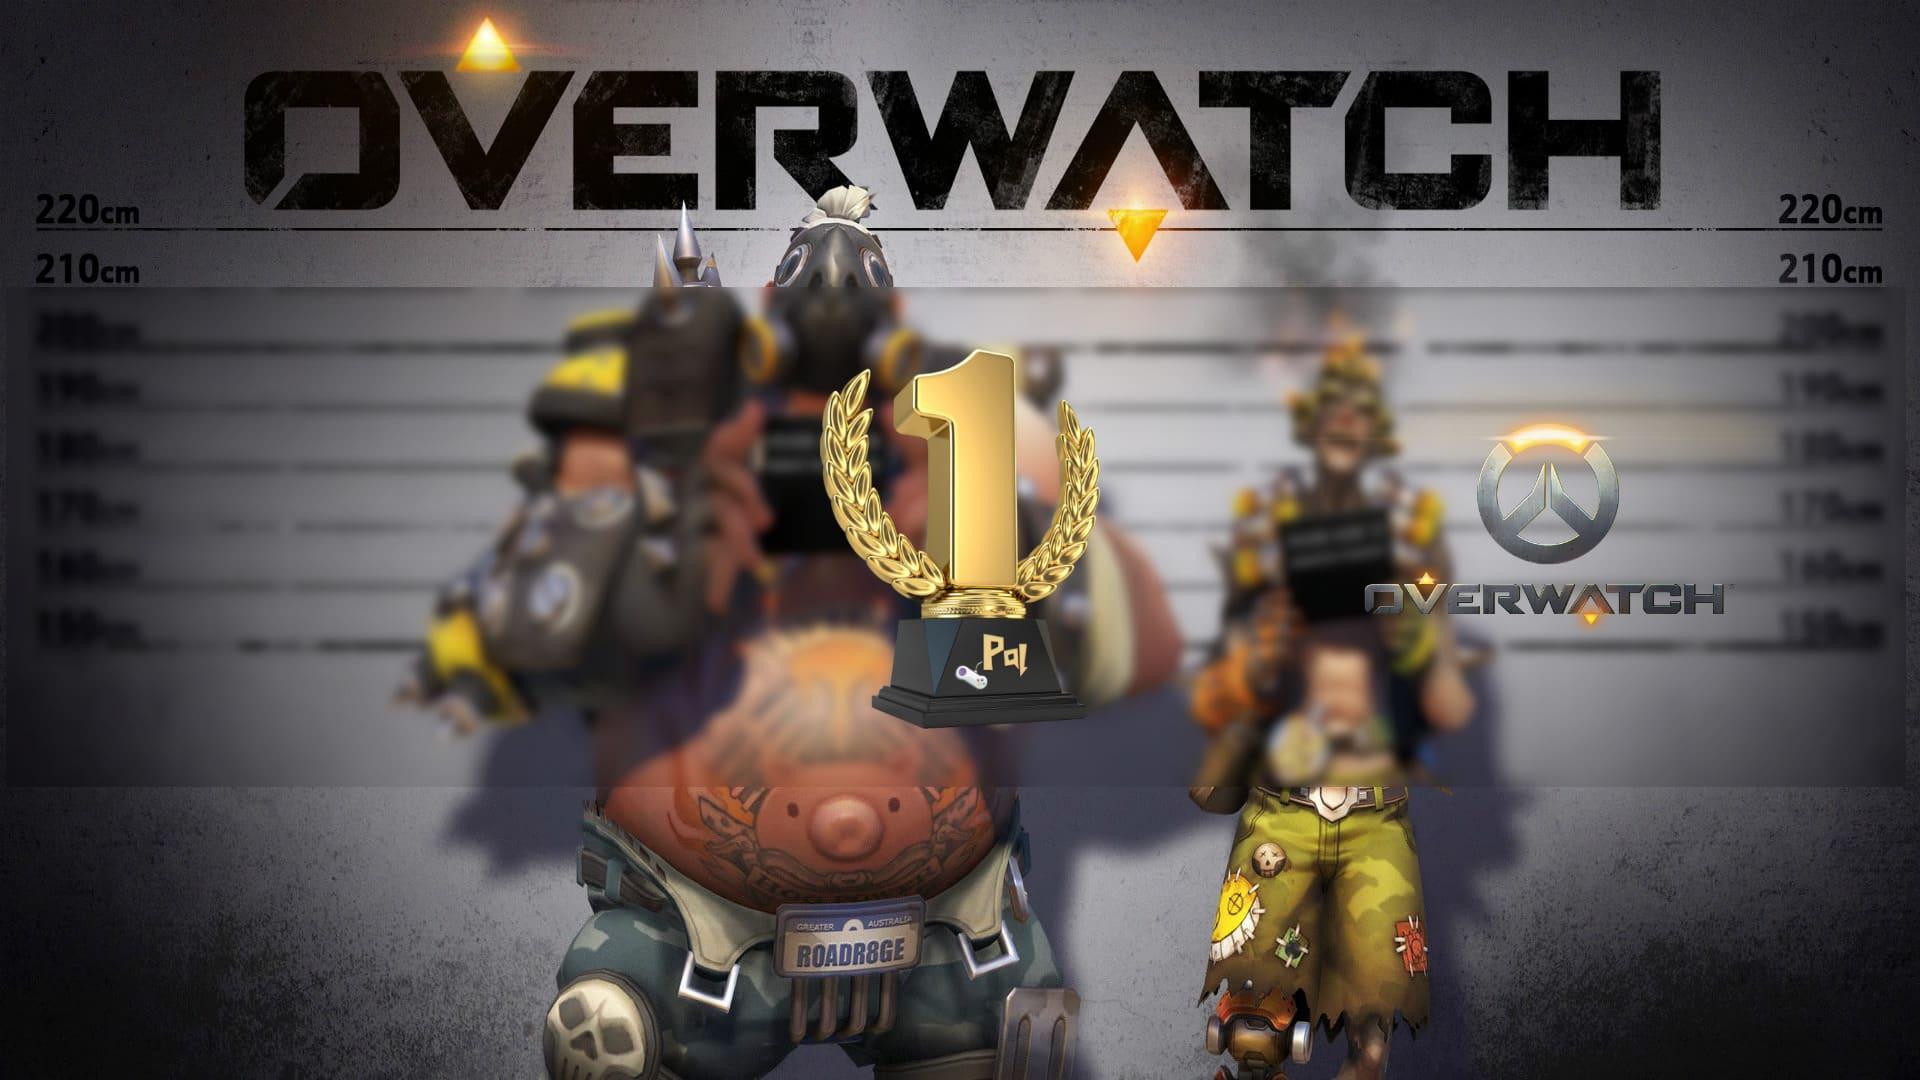 Overwatch-1stpage.jpg